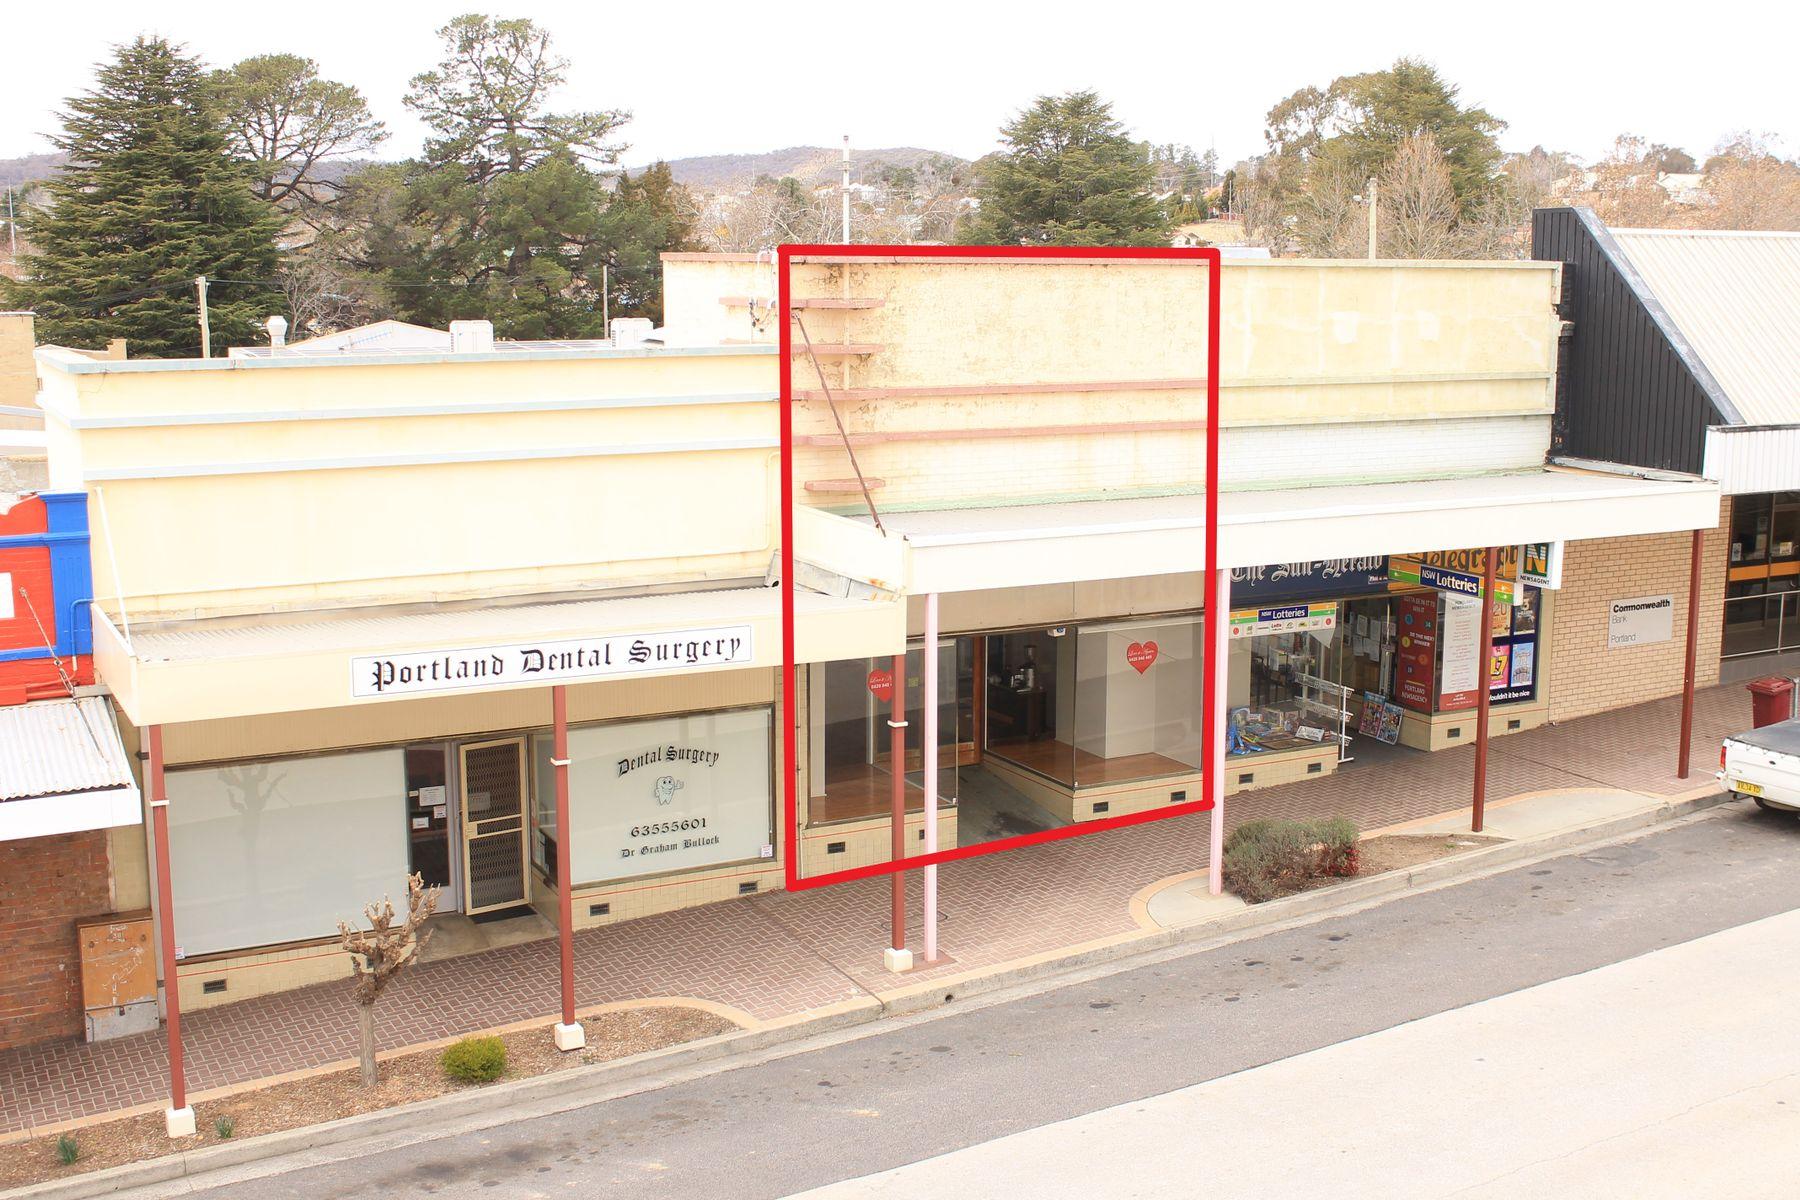 7 sofala st portland nsw bridgeport sofa buy sell and rent real estate in orange oberon